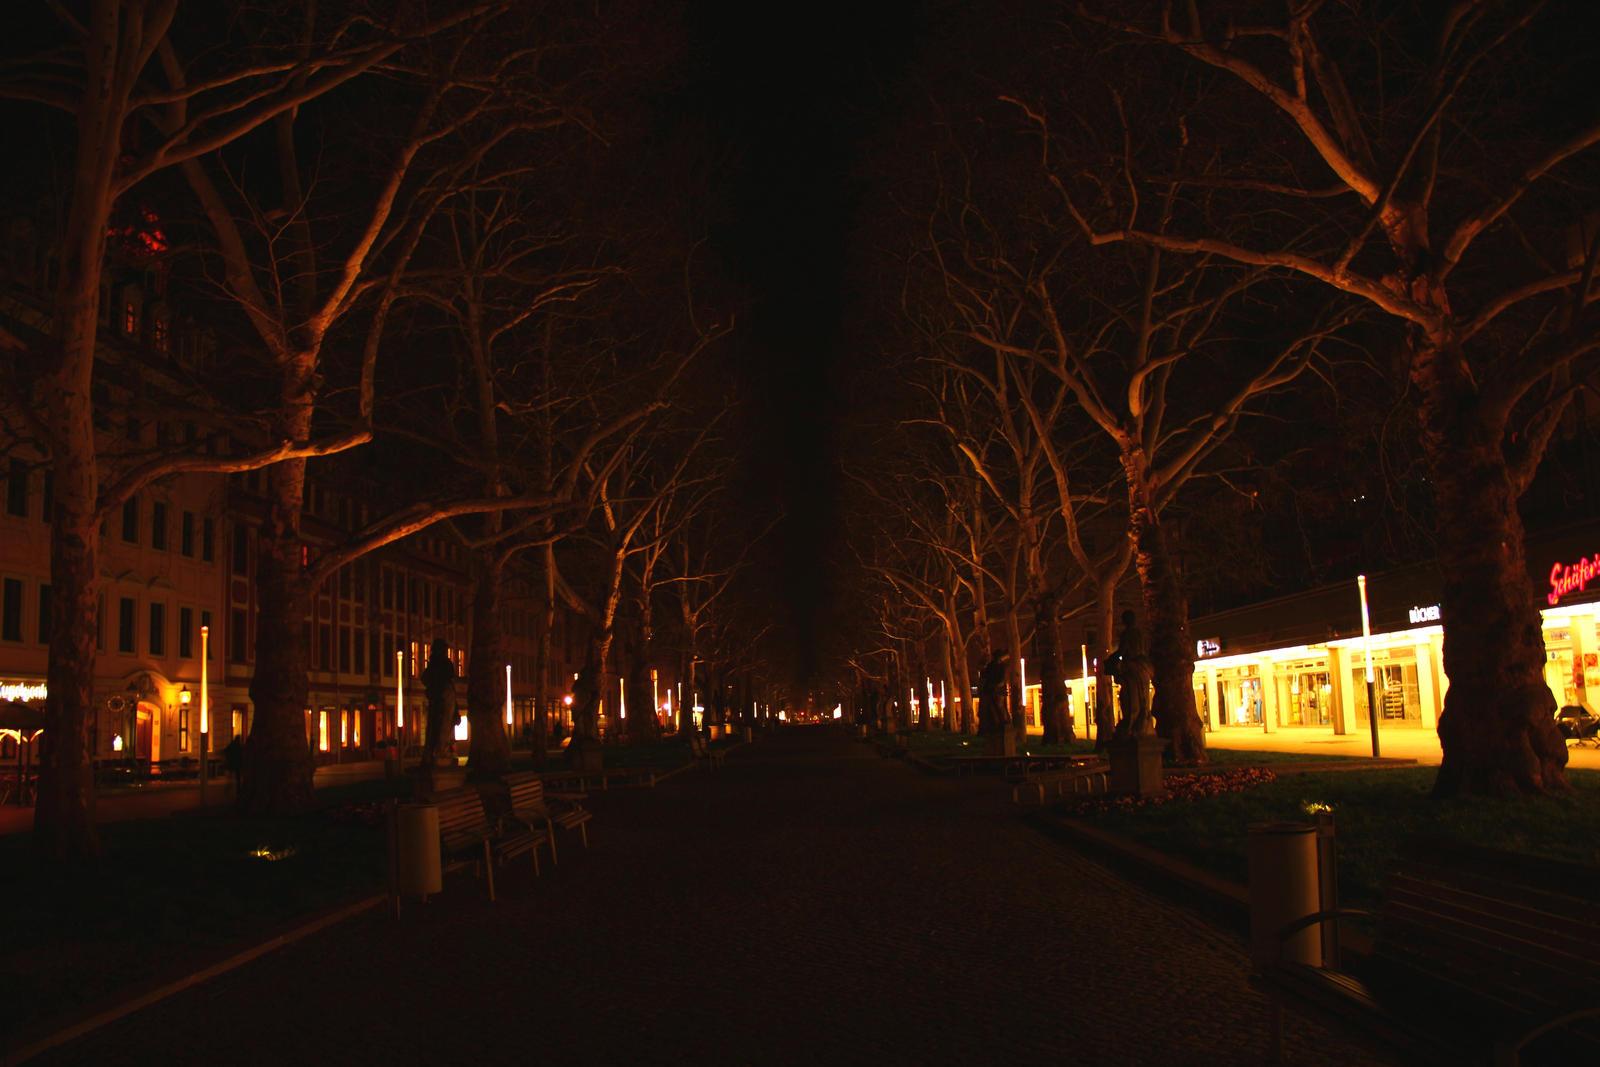 light on dark way by LoveForDetails